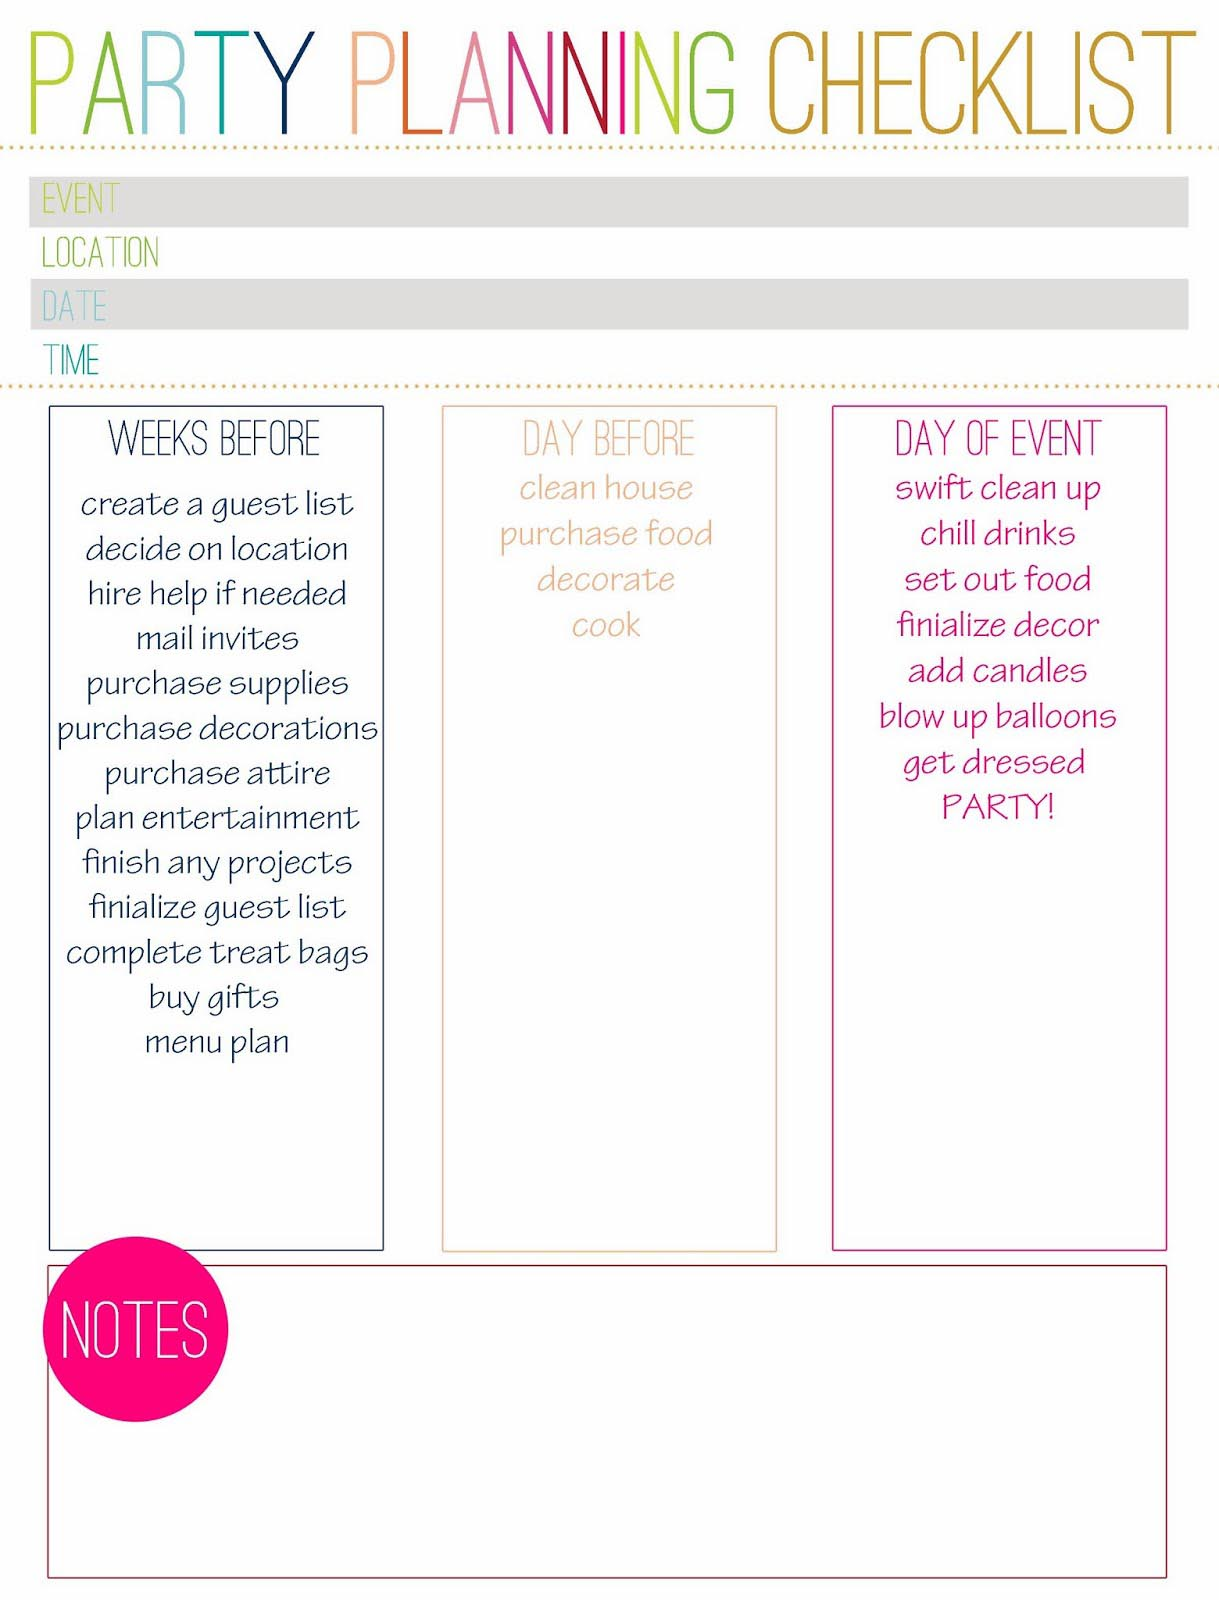 Wedding 101s That Make Planning Way Easier